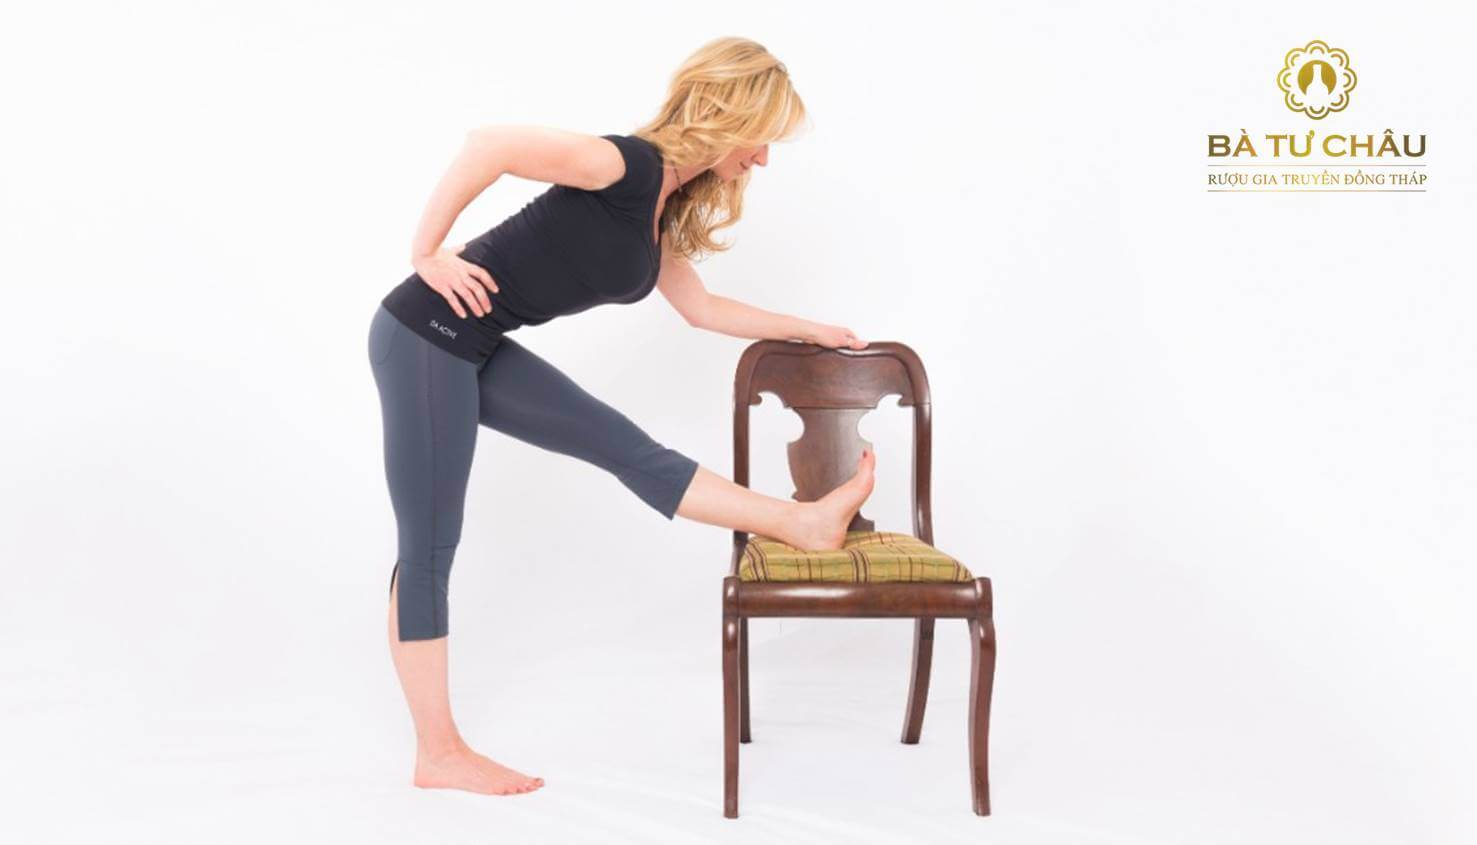 Tư thế yoga chim bồ câu biến thể